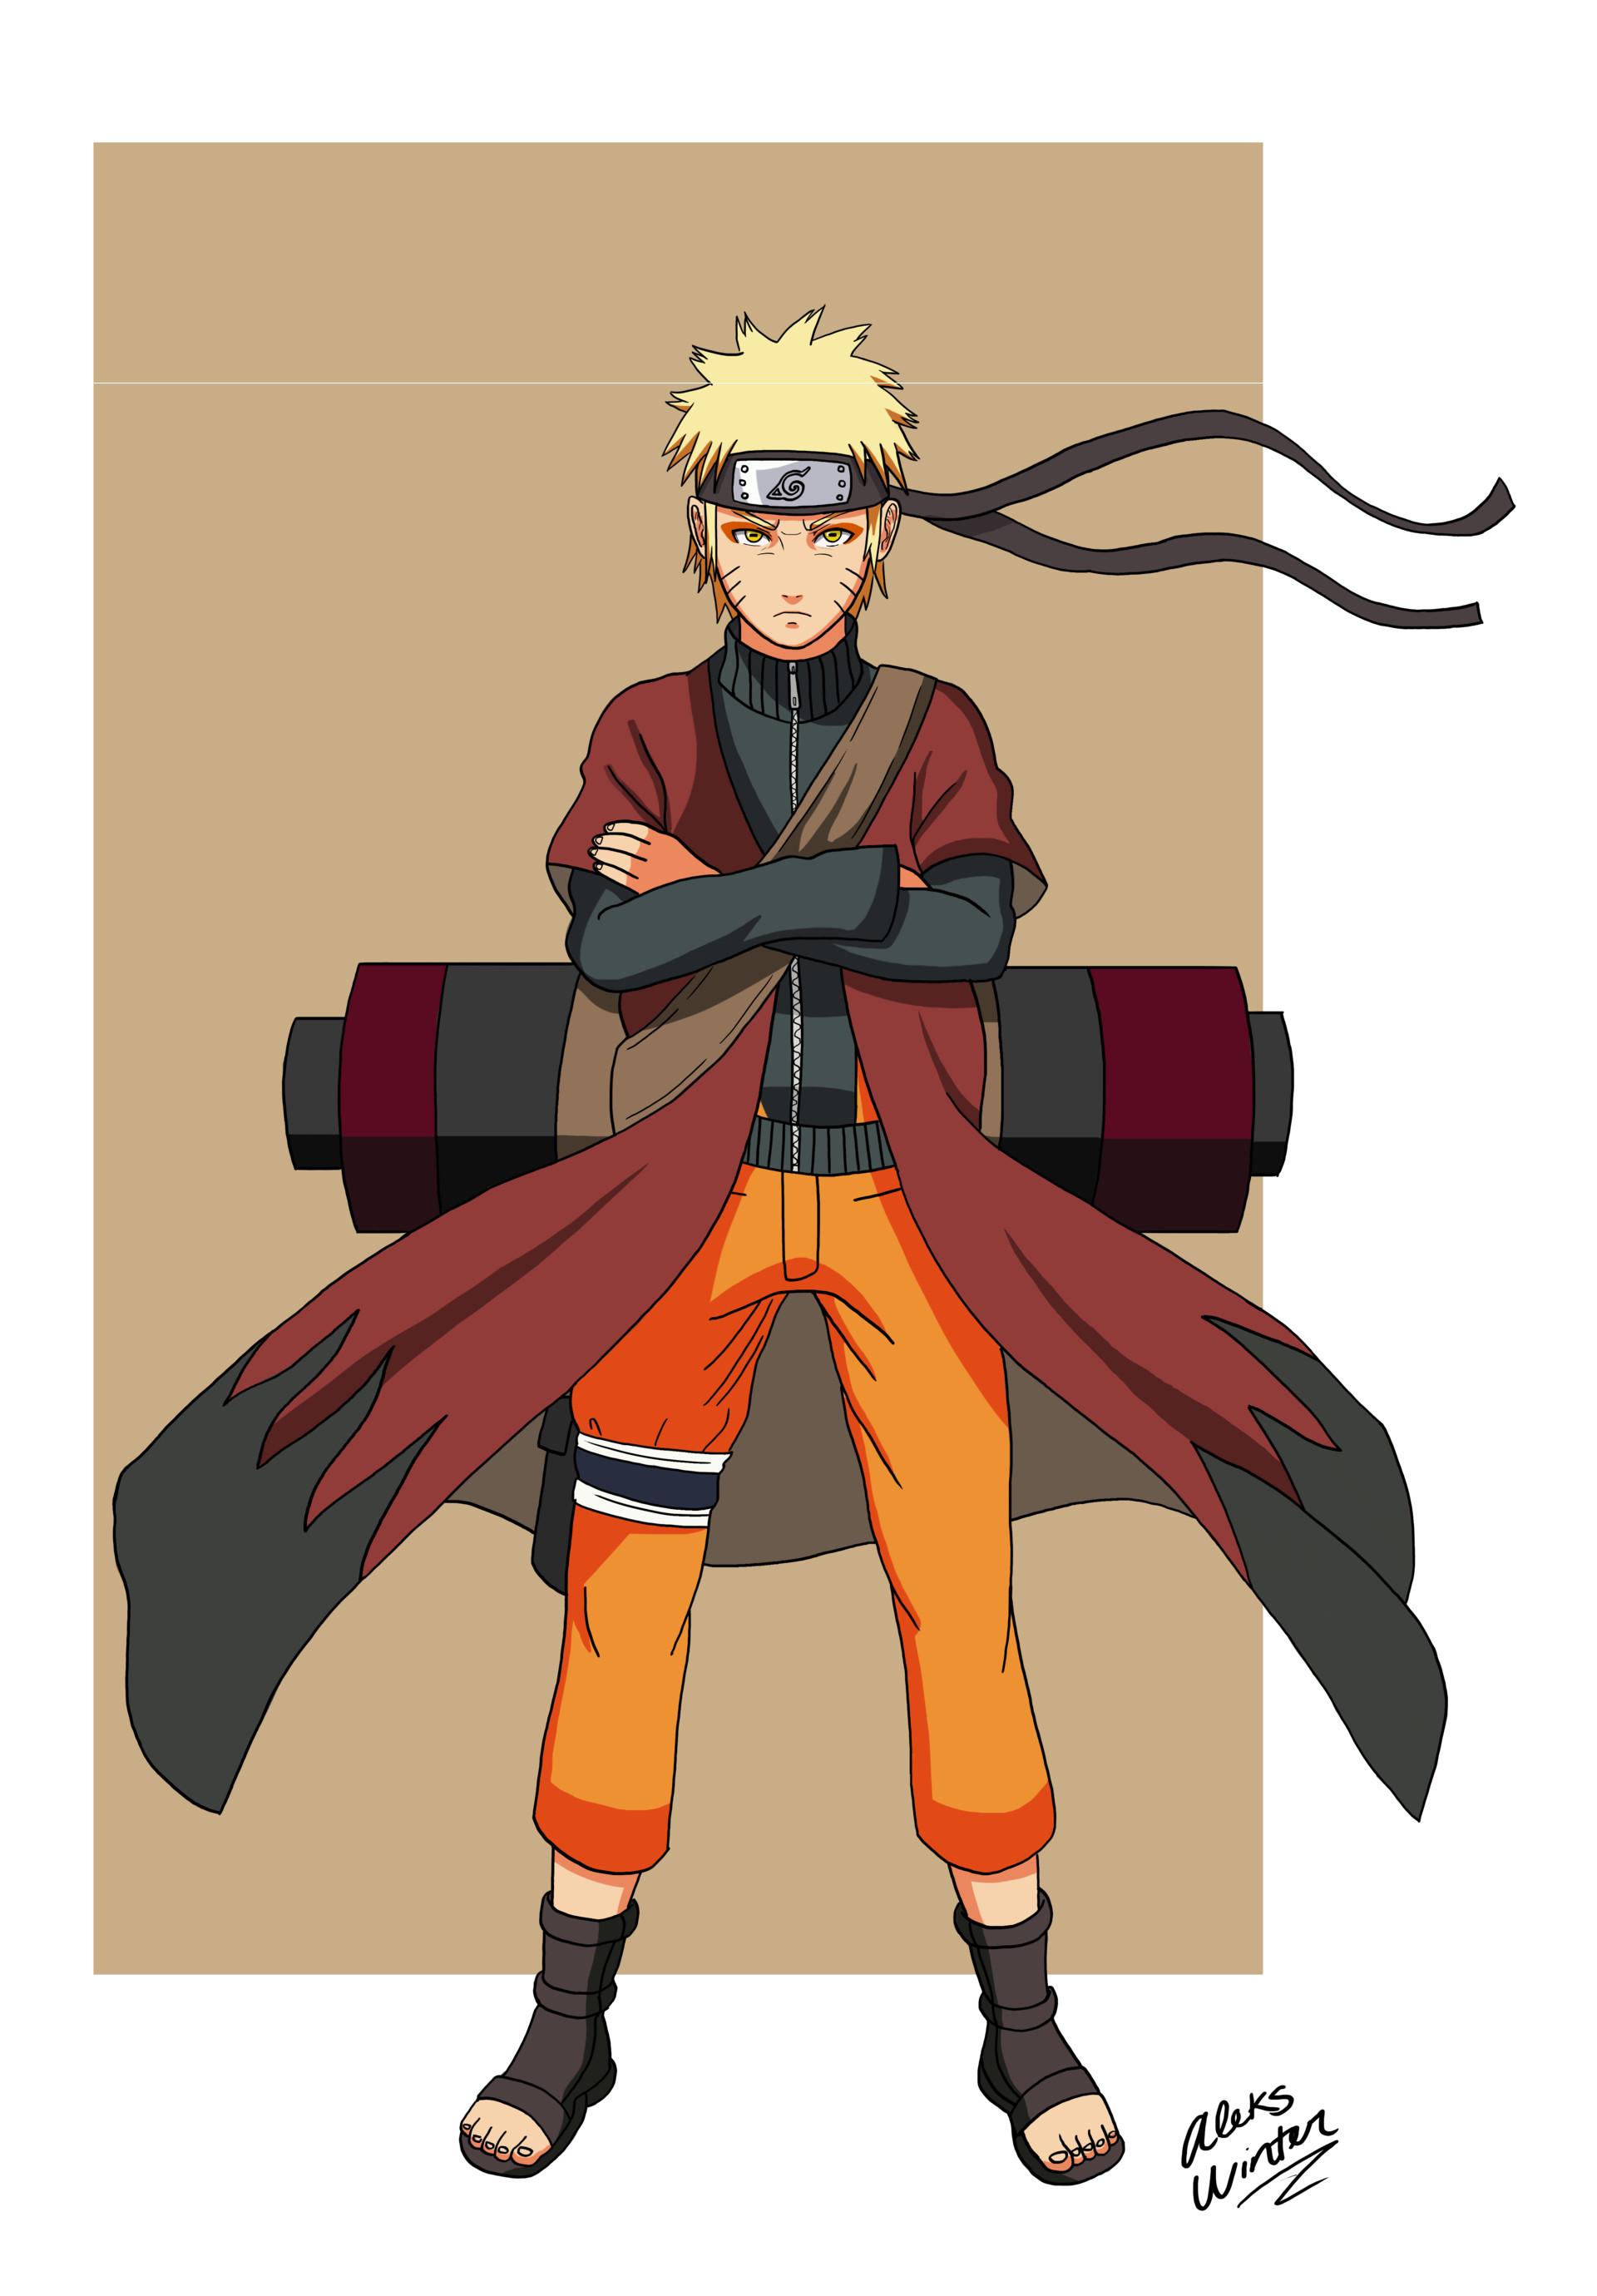 Sage Mode Naruto (Naruto) vs Karna (Fate/Apocrypha) | SpaceBattles Forums